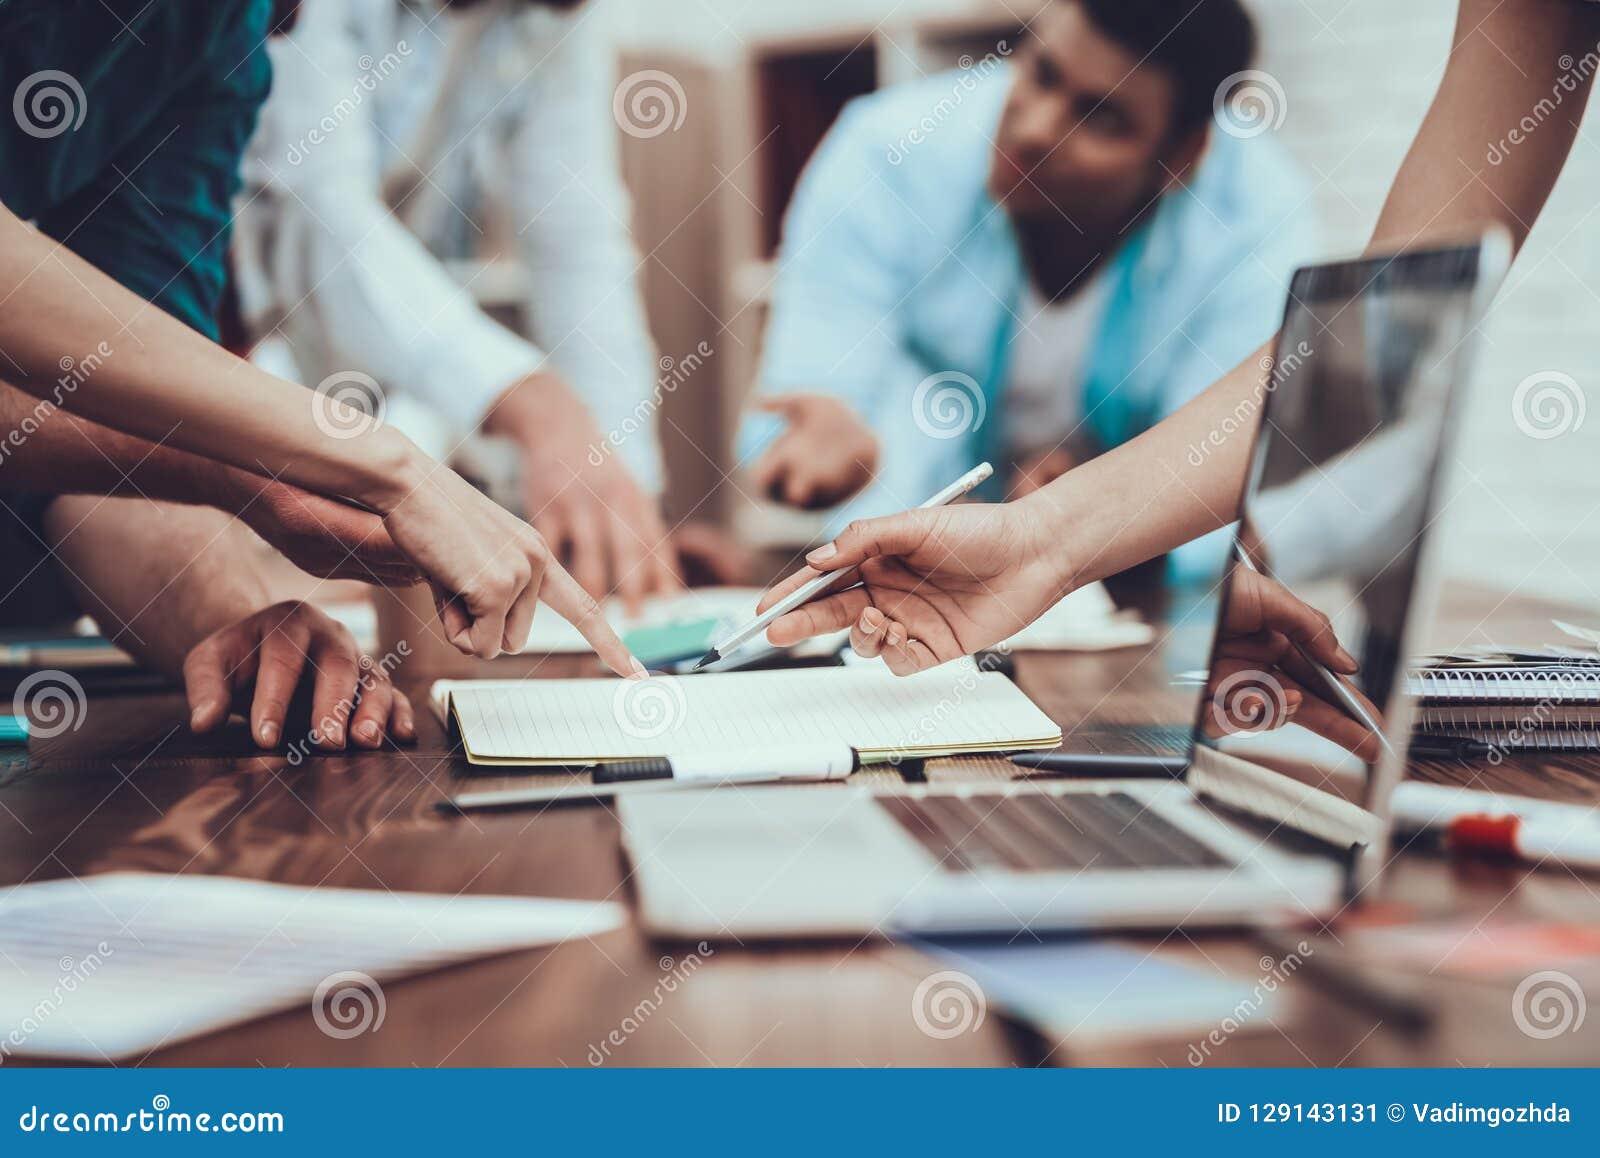 Projet teamwork ordinateurs Ordinateur portatif Conception